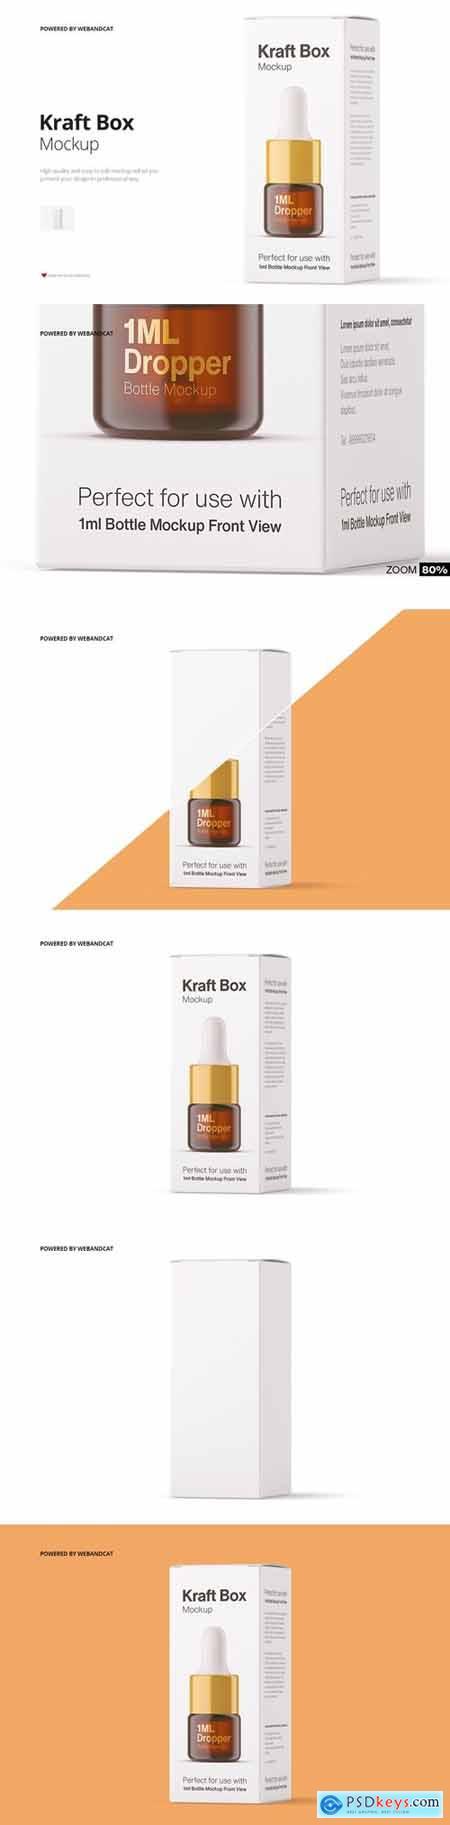 Kraft Paper Box Mockup for Dropper Bottle